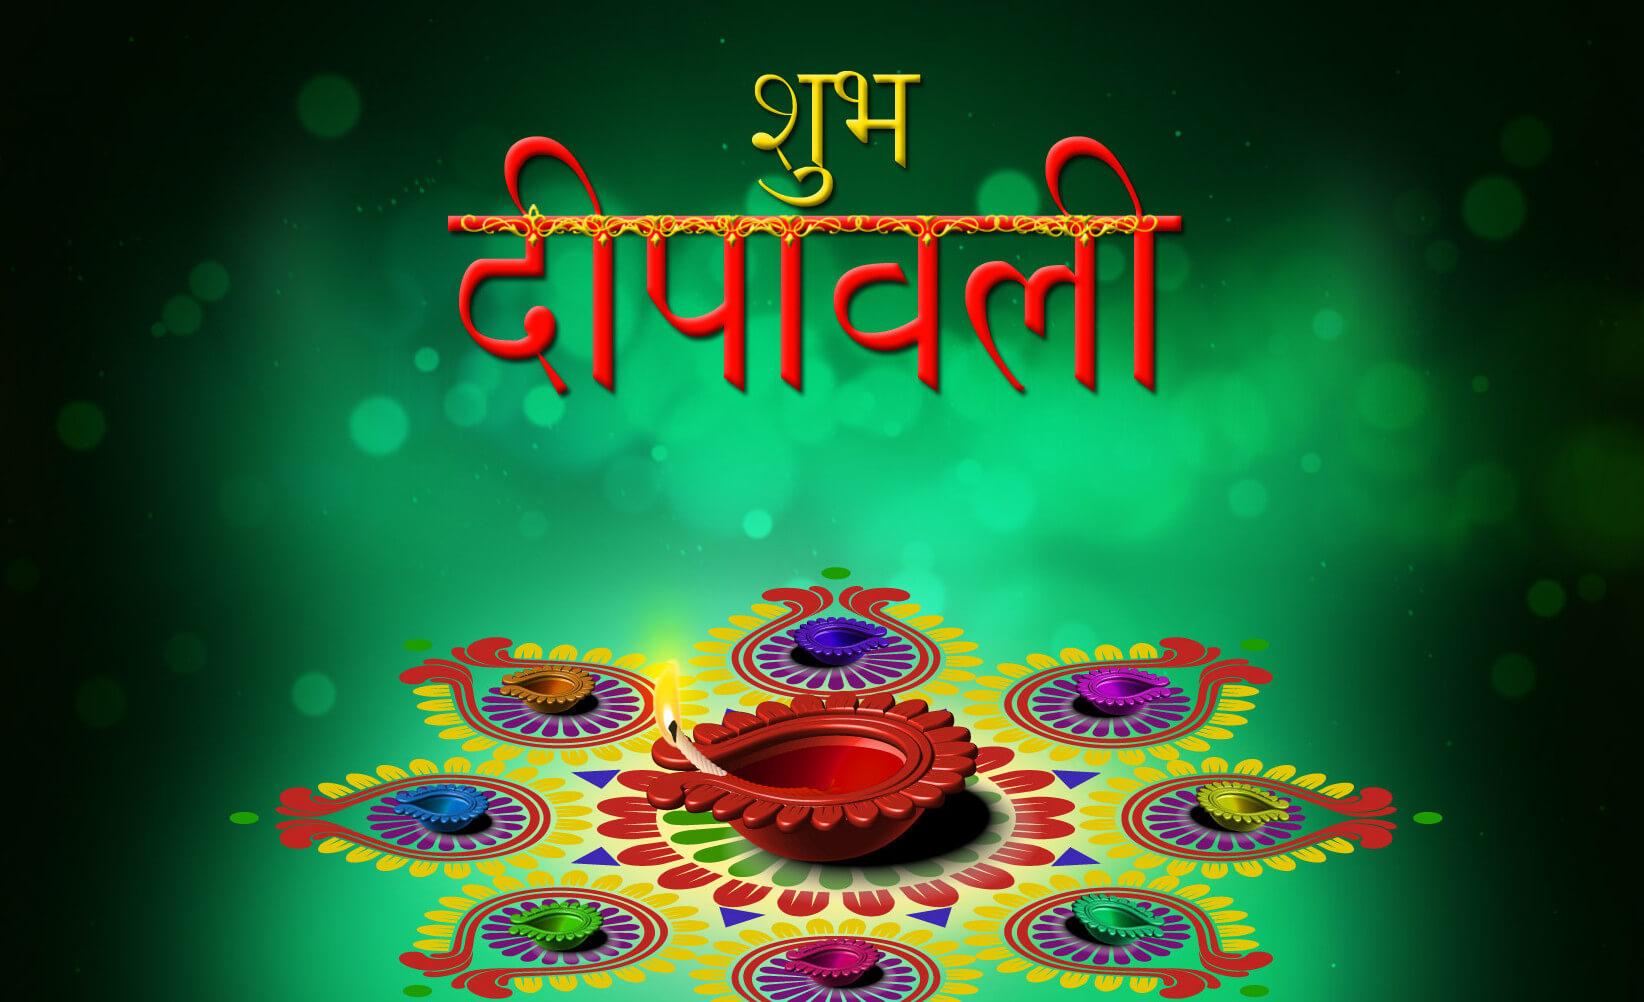 subh diwali 2017 greeting card wallpaper image